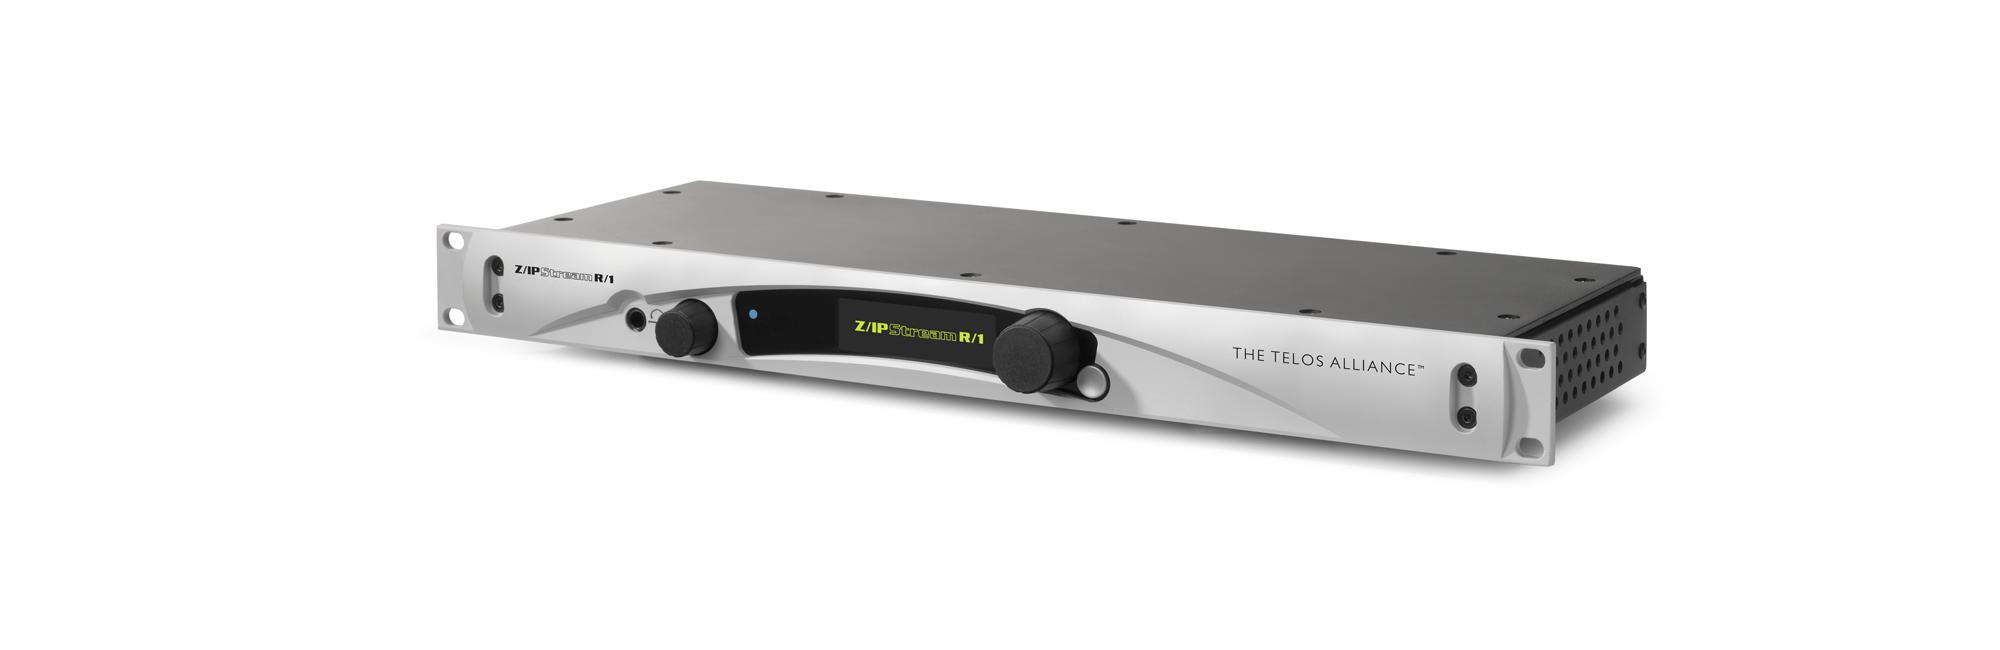 Telos Alliance Z/IPStream R/1